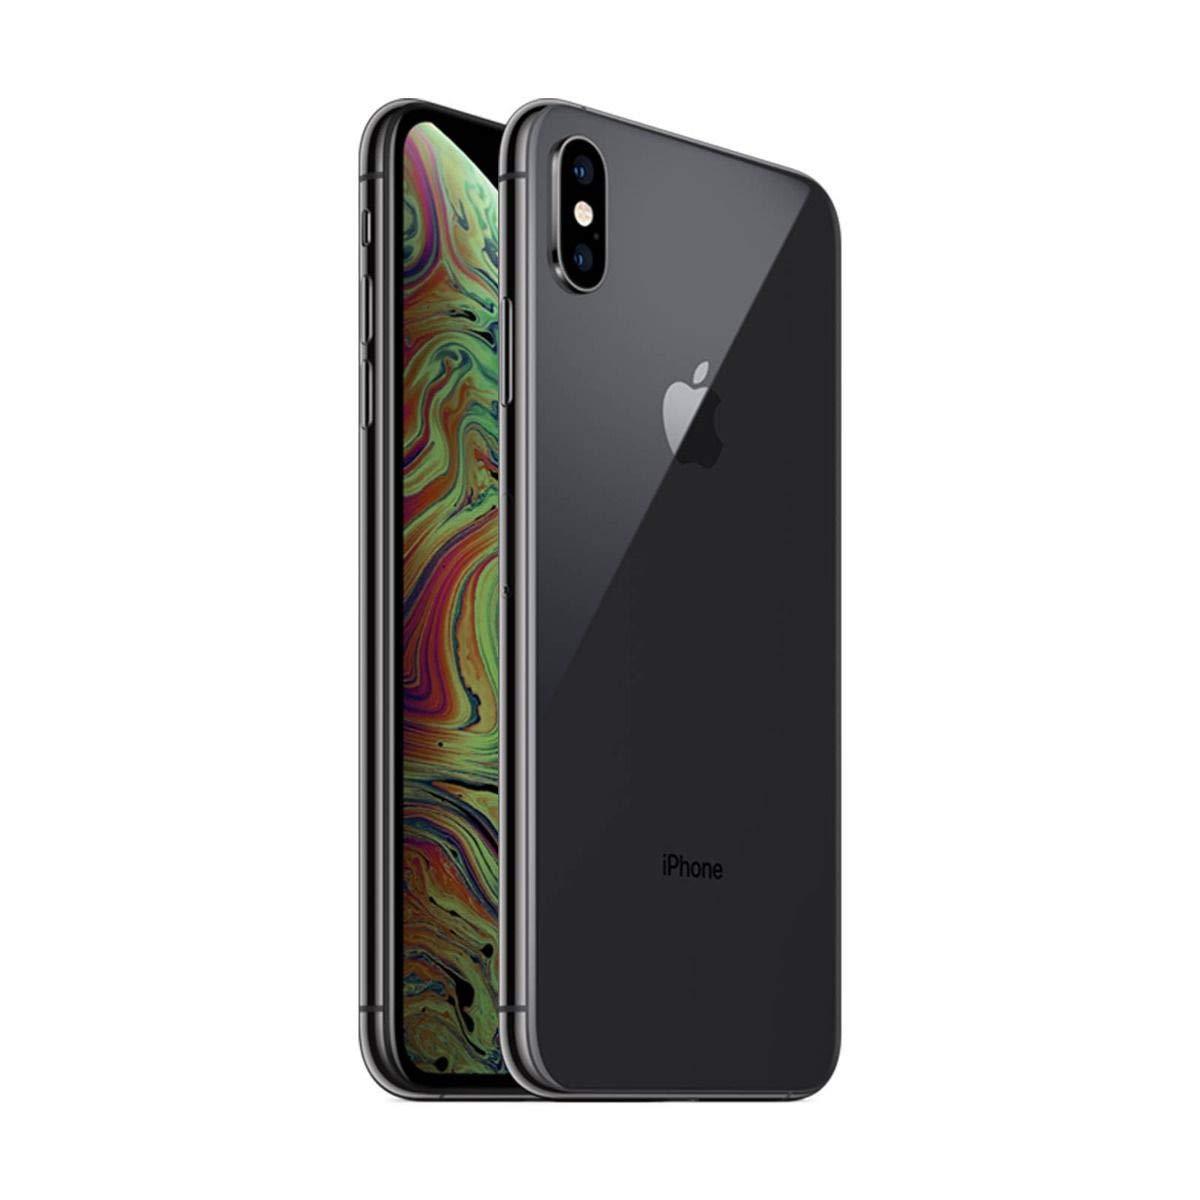 Apple iPhone XS Max, 256GB, Space Gray - For Verizon (Renewed)